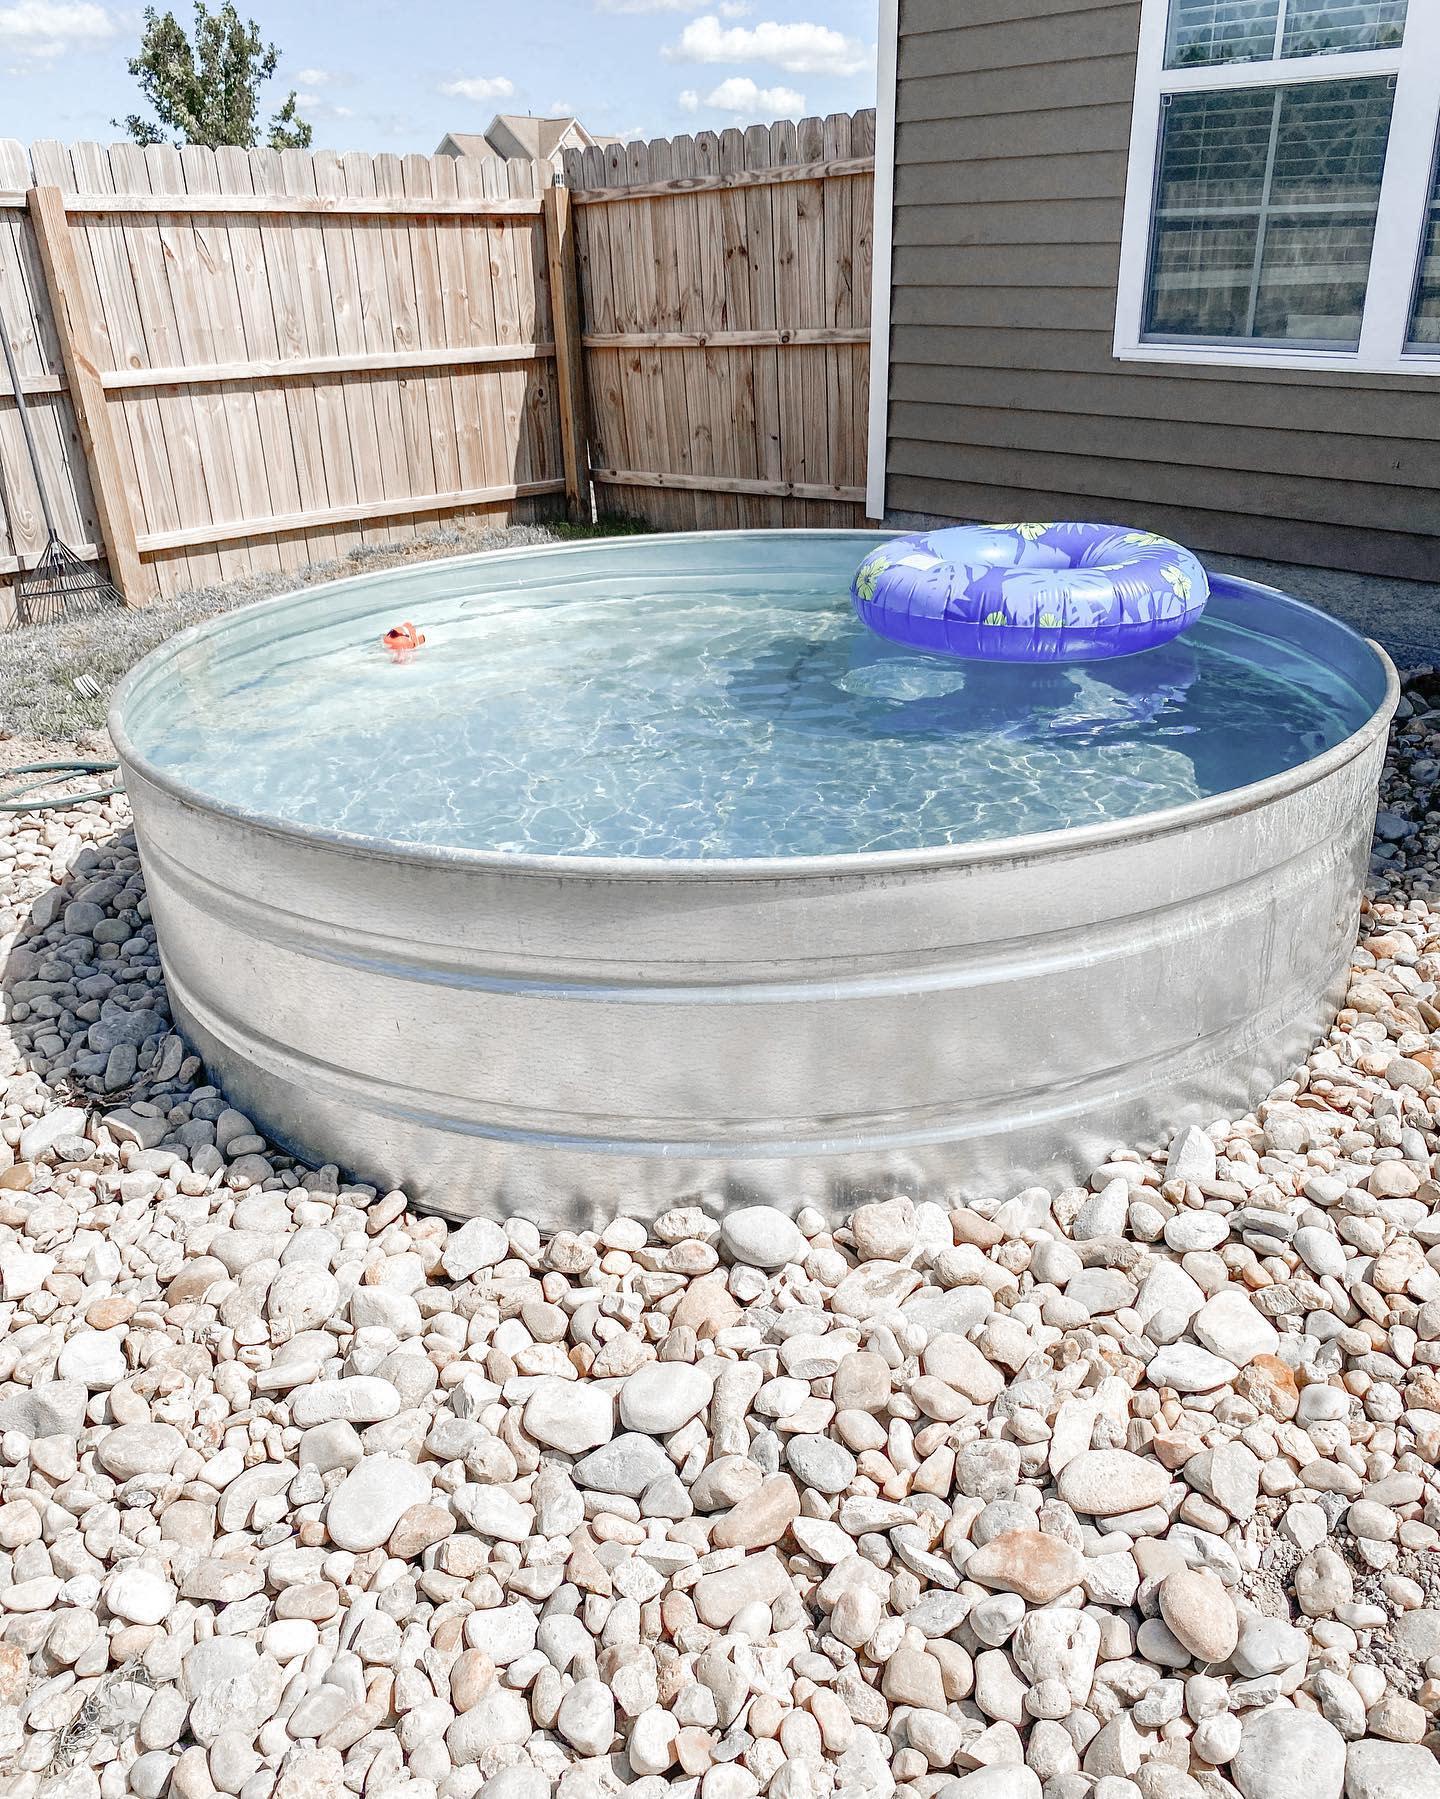 galvanized-stock-tank-pool-ideas-adailydoseofchristianna